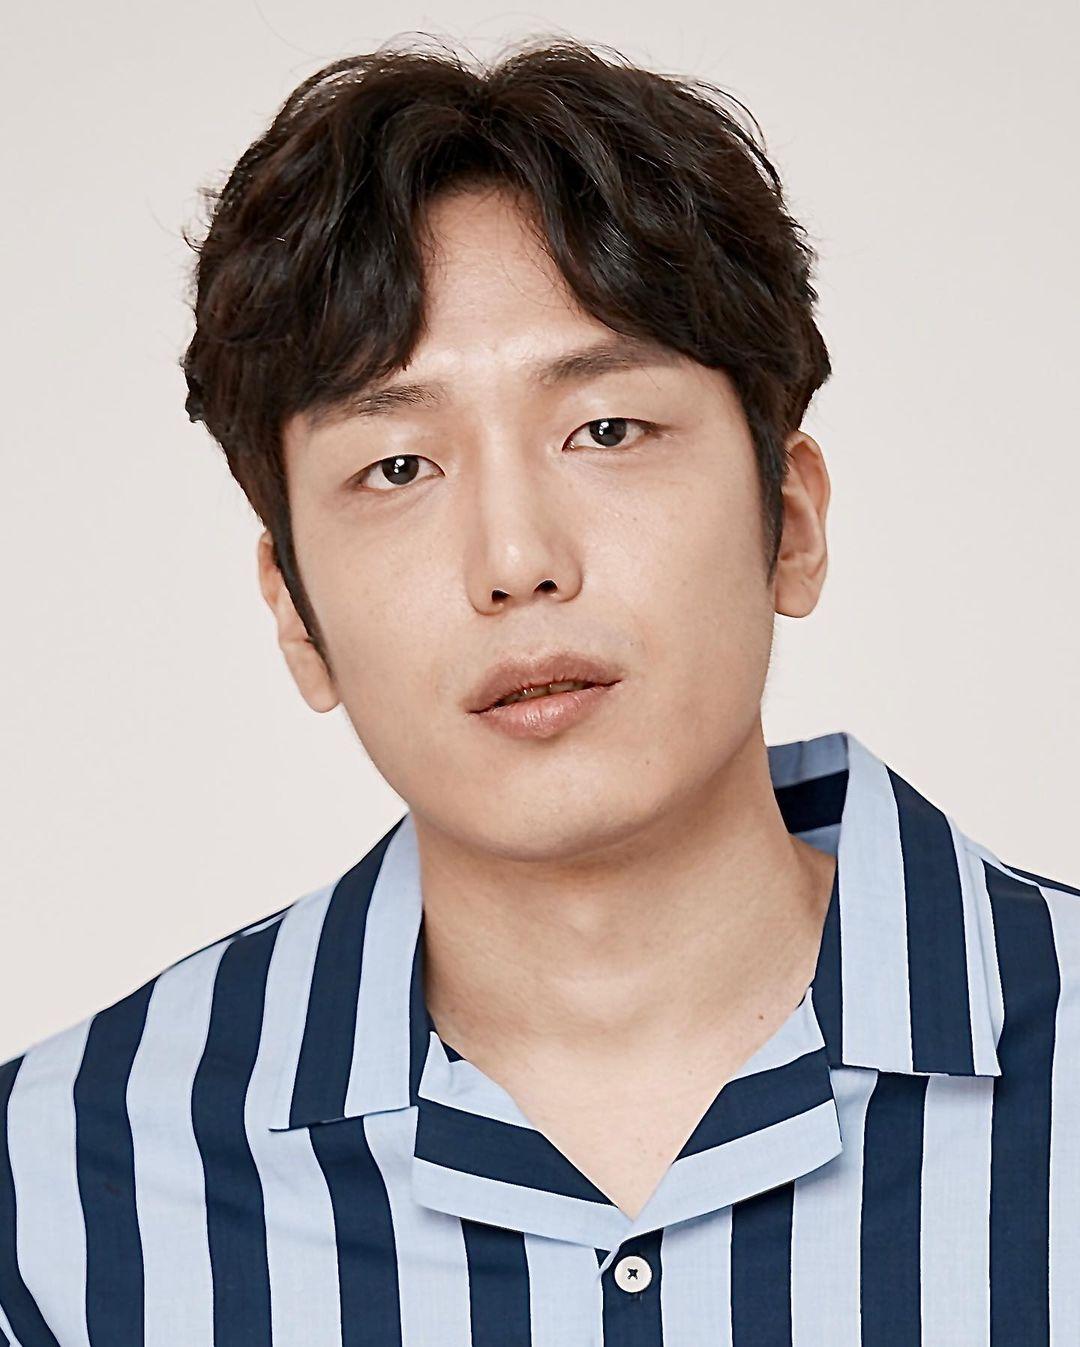 Kim Hyeong-gyu : hyeong-gyu, Hyeong-Gyu, AsianWiki